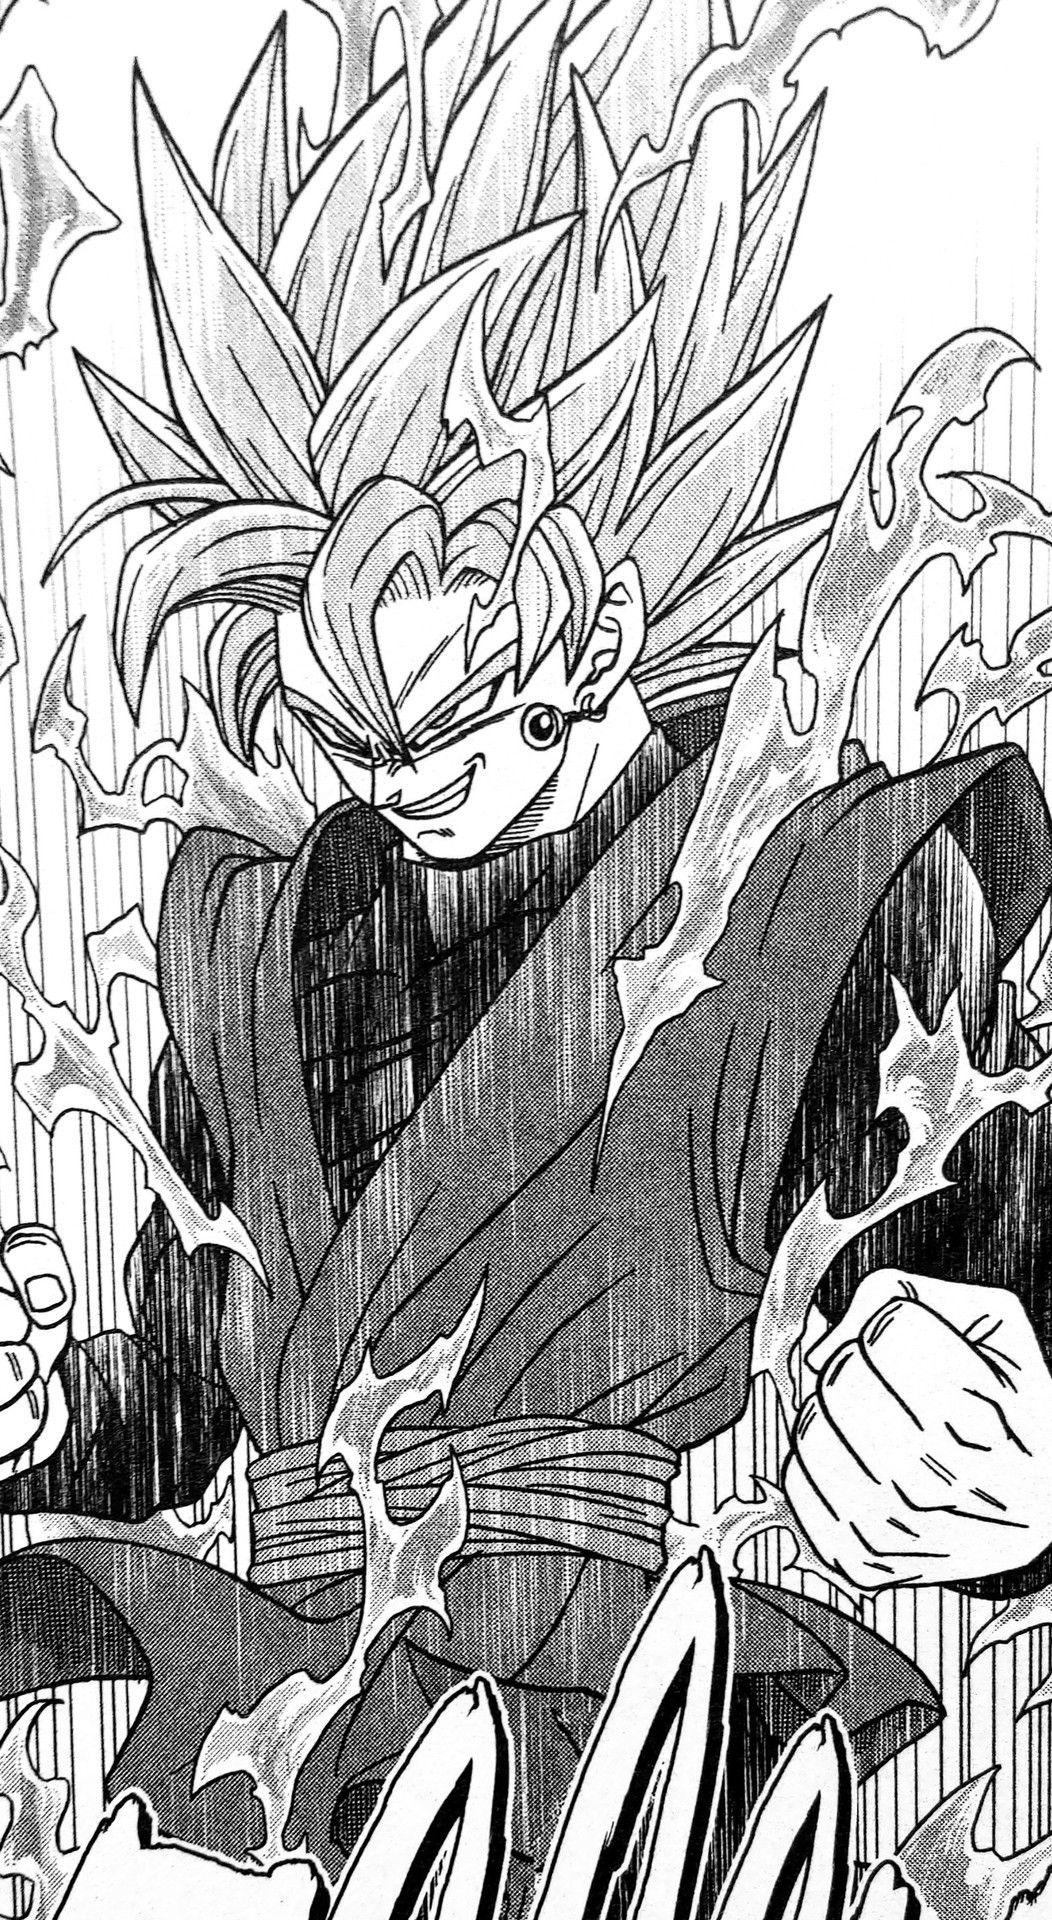 Still Catching Up On The Anime But Manga Goku Black Tells A Good Story Too Dragon Ball Artwork Anime Dragon Ball Super Dragon Ball Painting